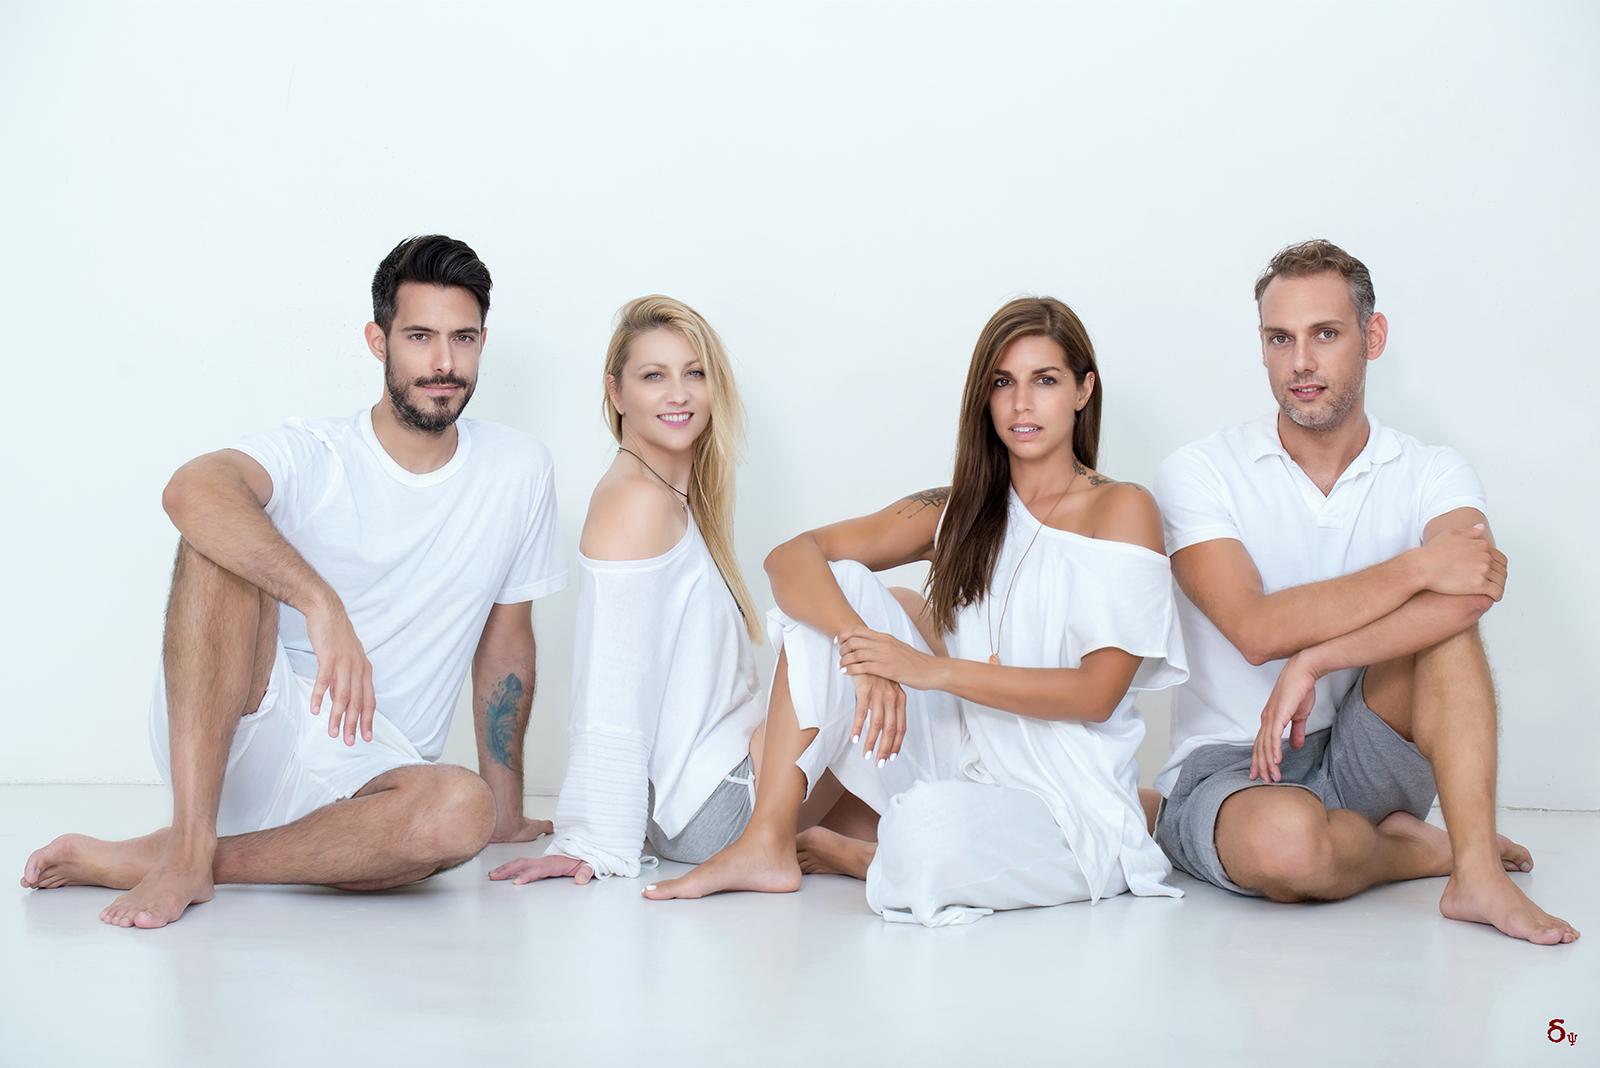 enosis yoga business portrait yoga photographer maganari , niko geo, george fragoulis, christina sampani